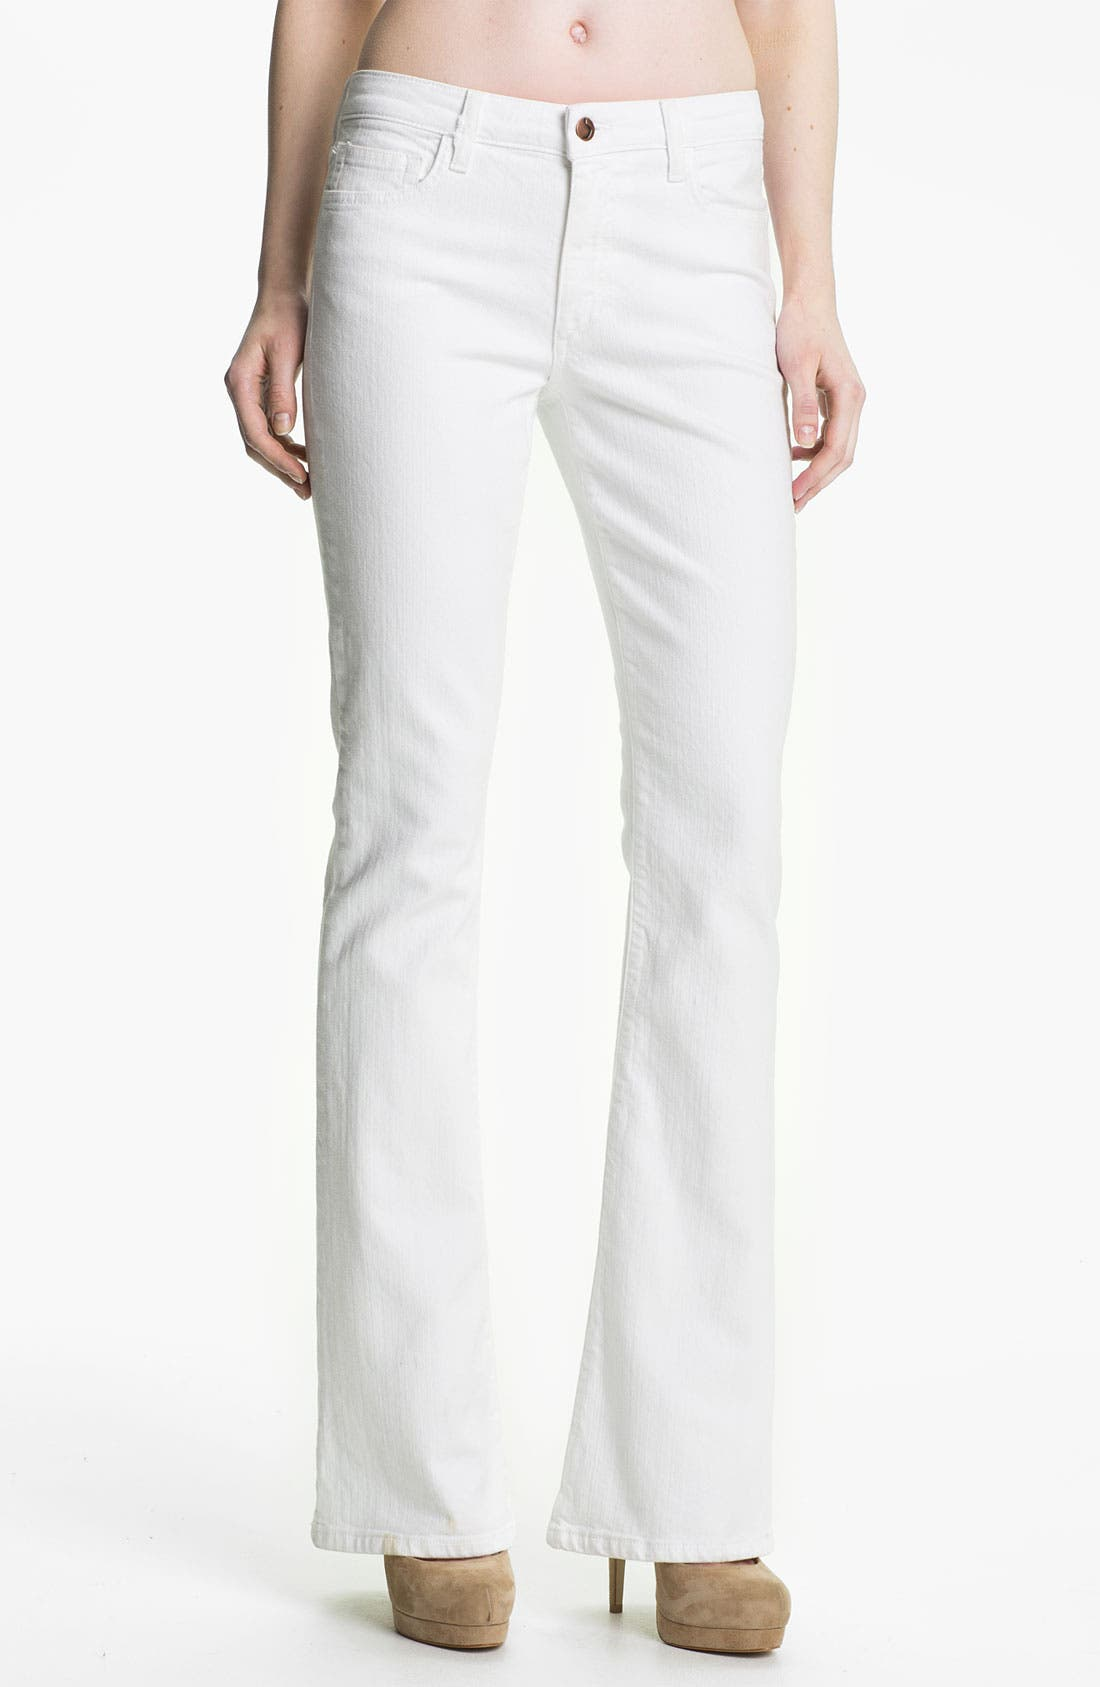 Alternate Image 1 Selected - Joe's 'Visionaire' Stretch Denim Bootcut Jeans (Bonnie)